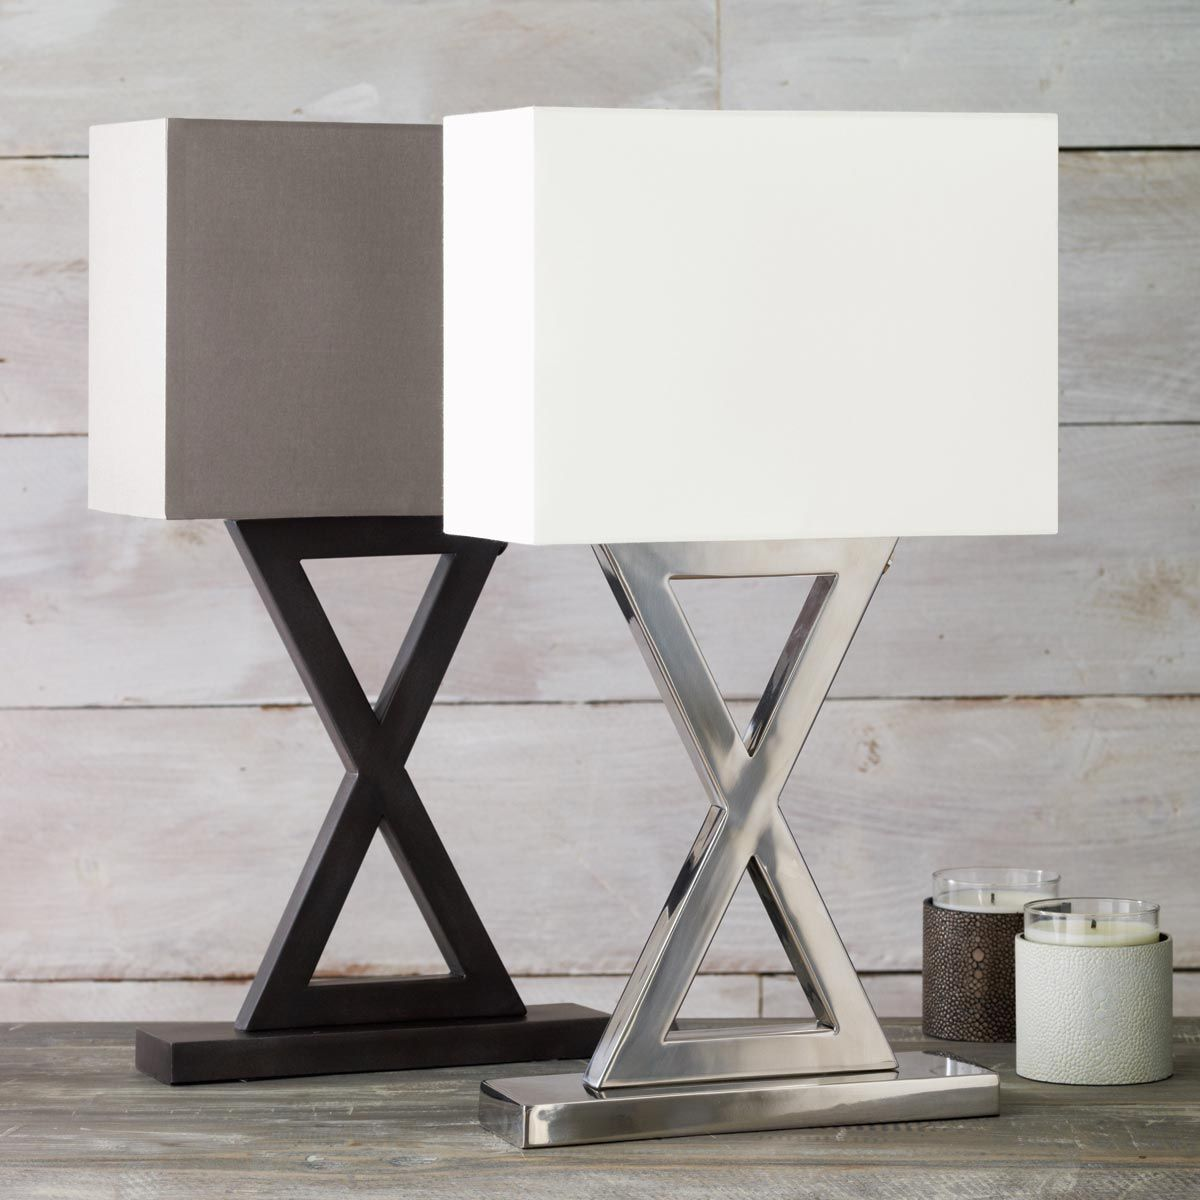 Monochrome 'X' Lamp, Narrow Contemporary table lamps